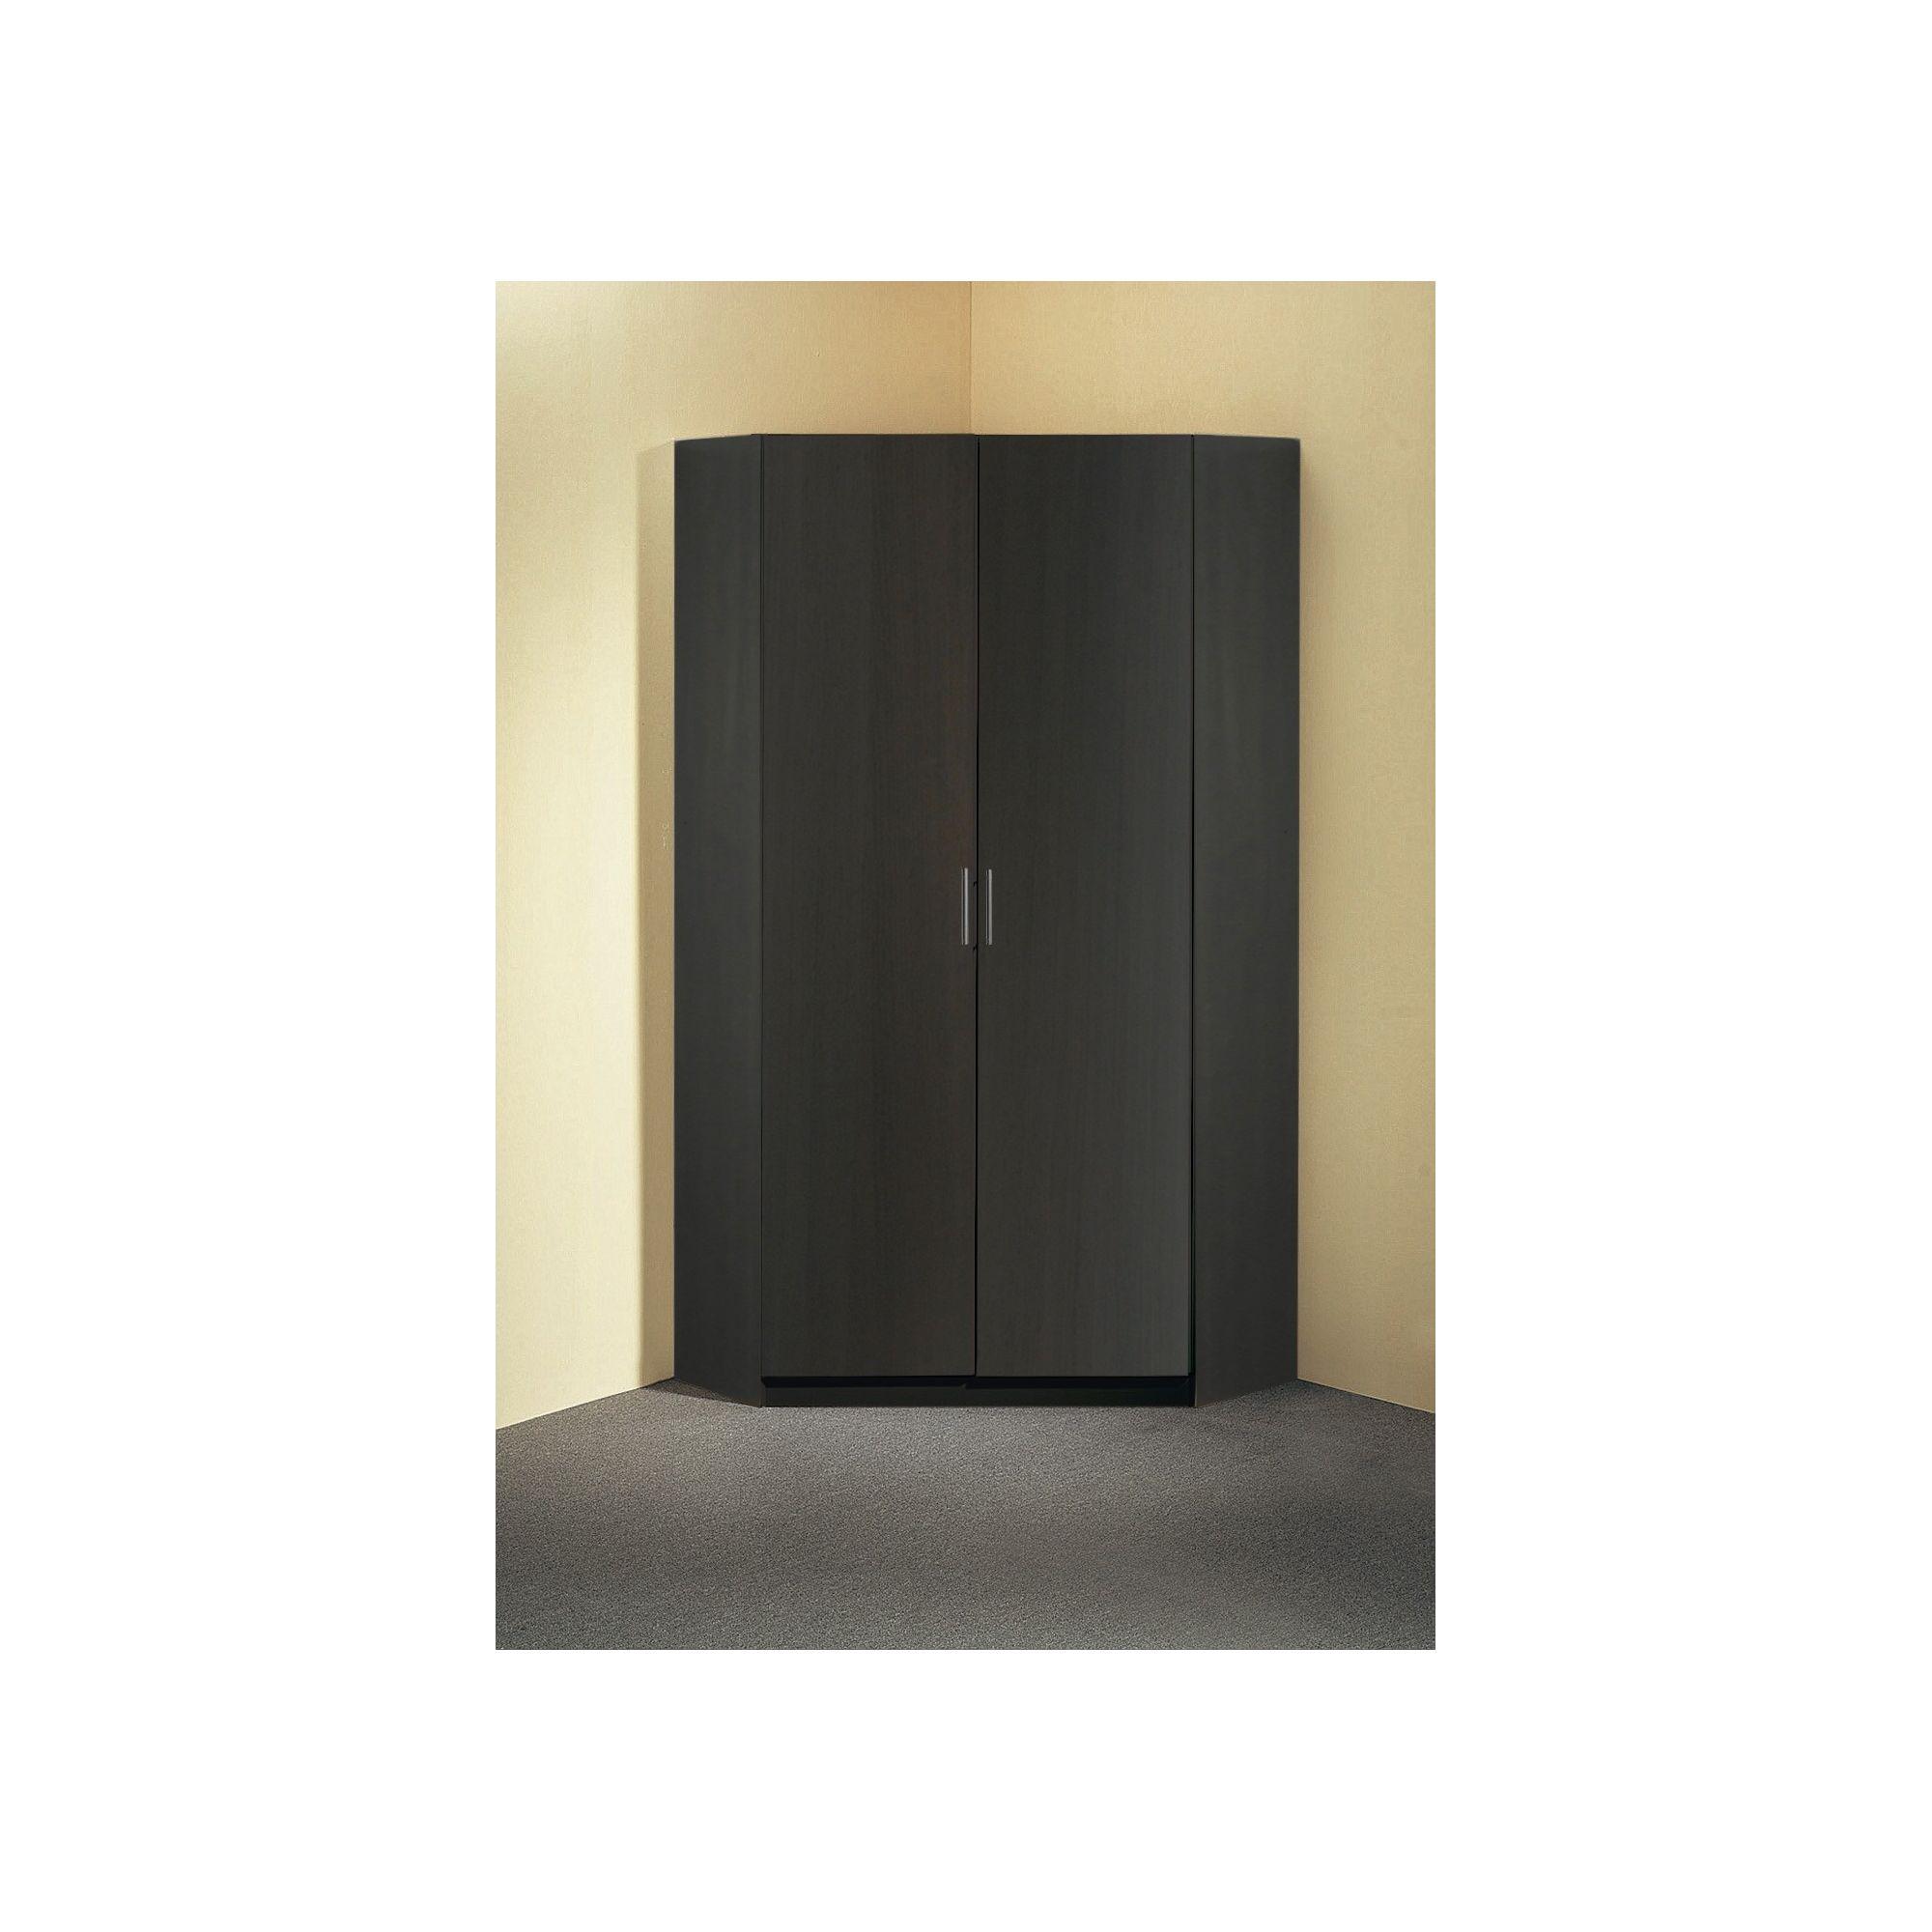 Amos Mann furniture Venice 2 Door Cornerwardrobe - White at Tescos Direct